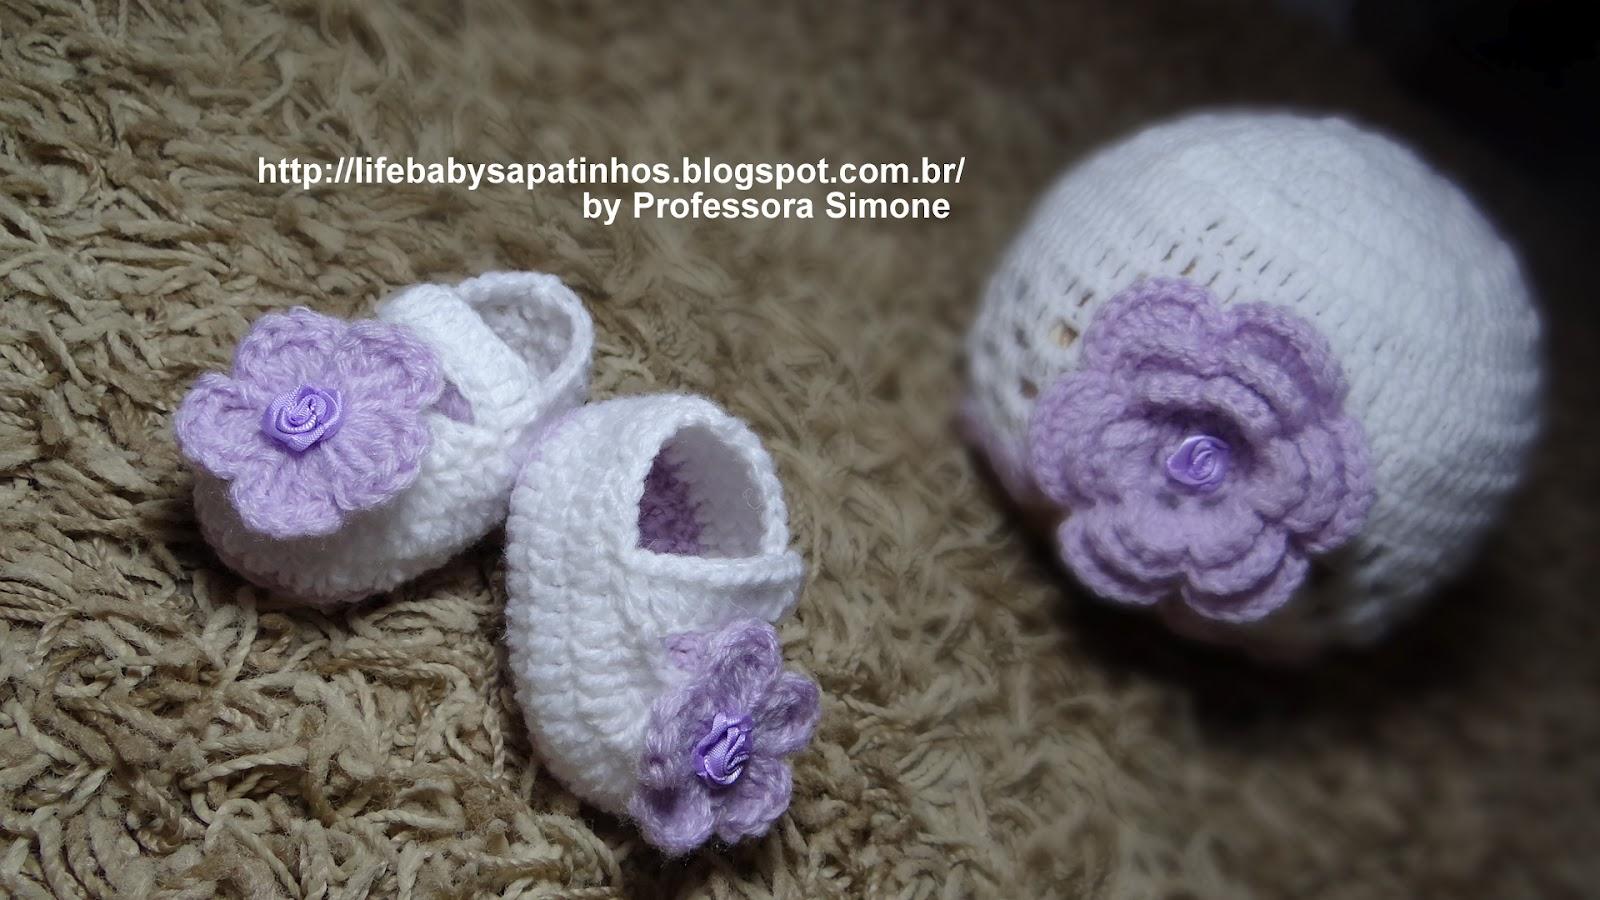 25bf4a9baed5d Receita touca + sapatinho para Bebê em Crochê - Ateliê do Crochê